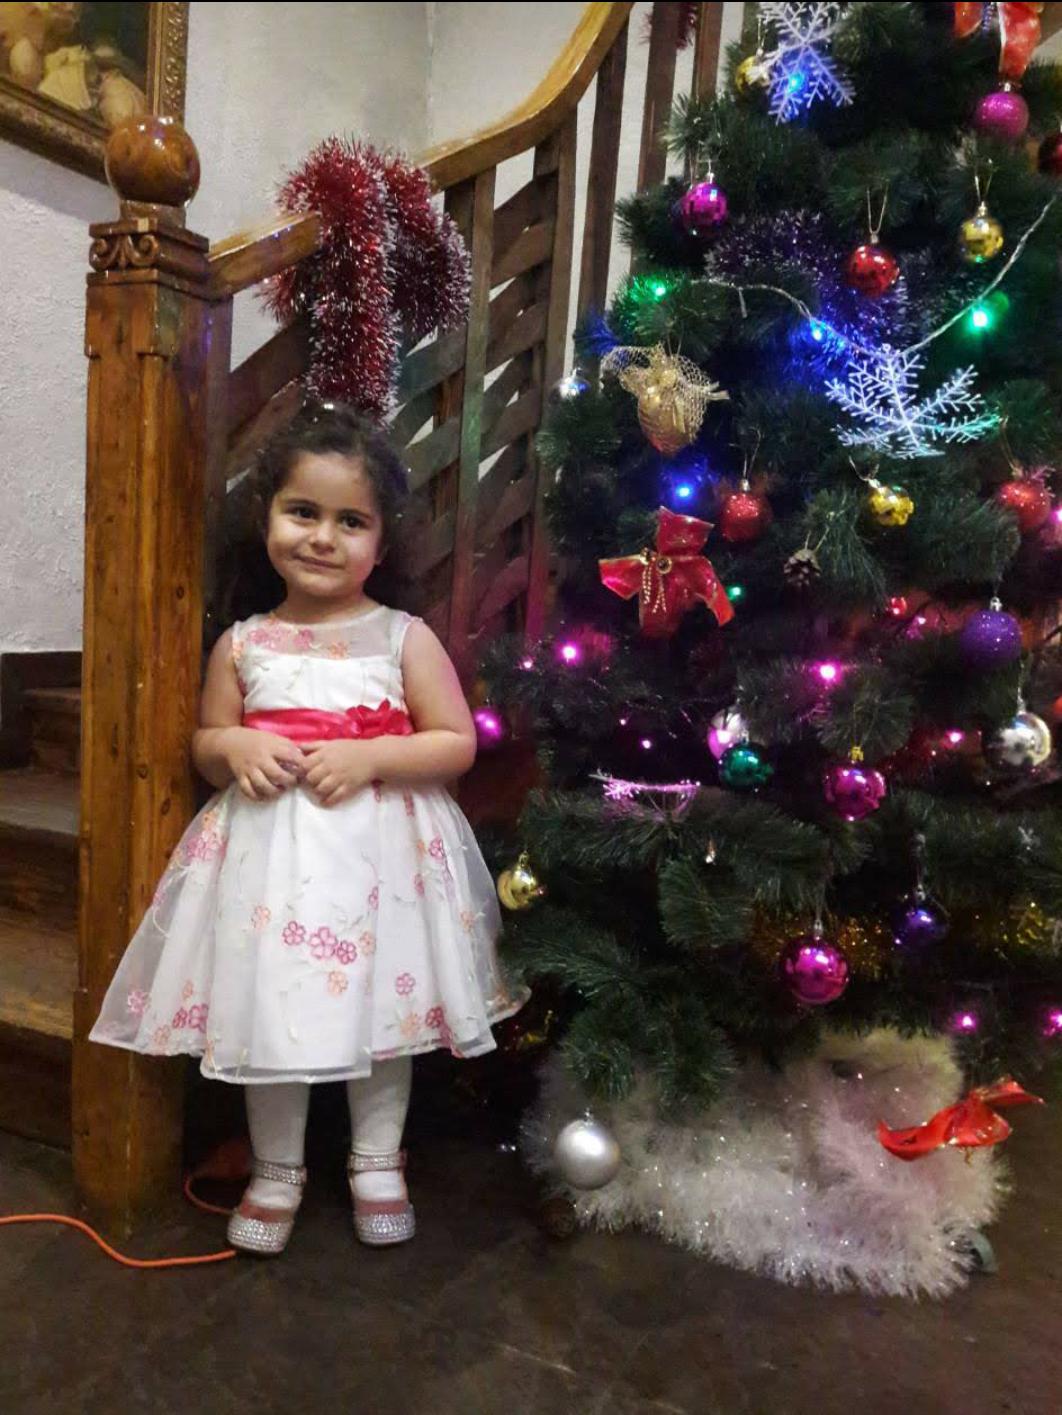 Рузи 4 годика... будущая актриса))). Принцесса собирается на бал